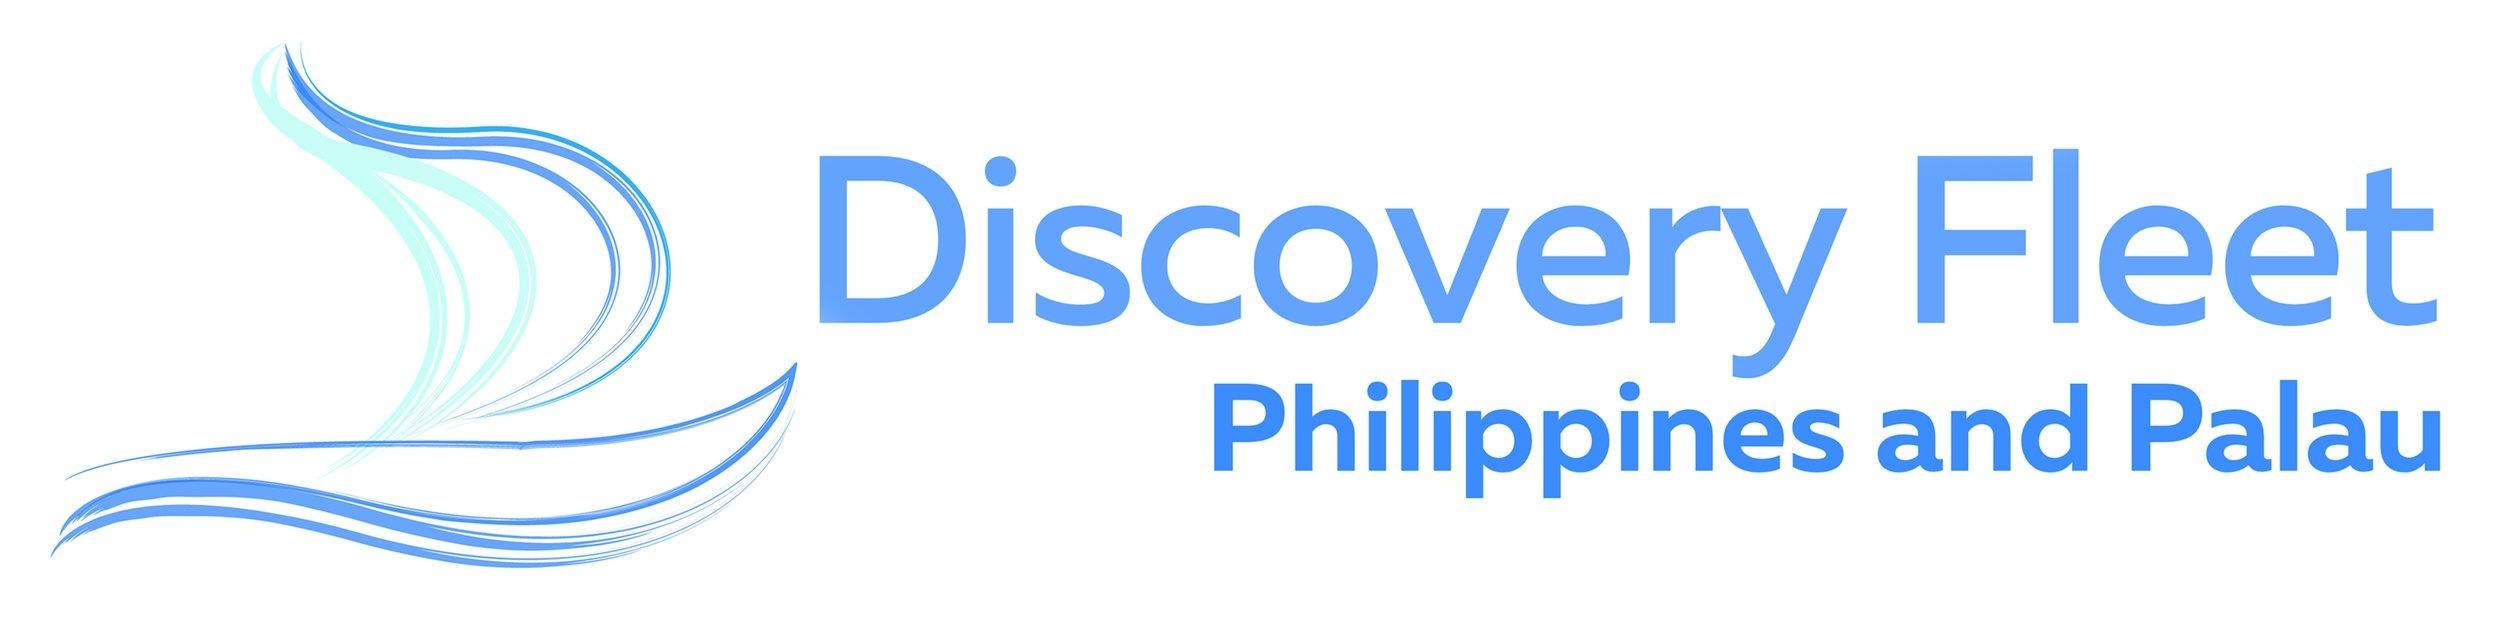 Discovery Fleet